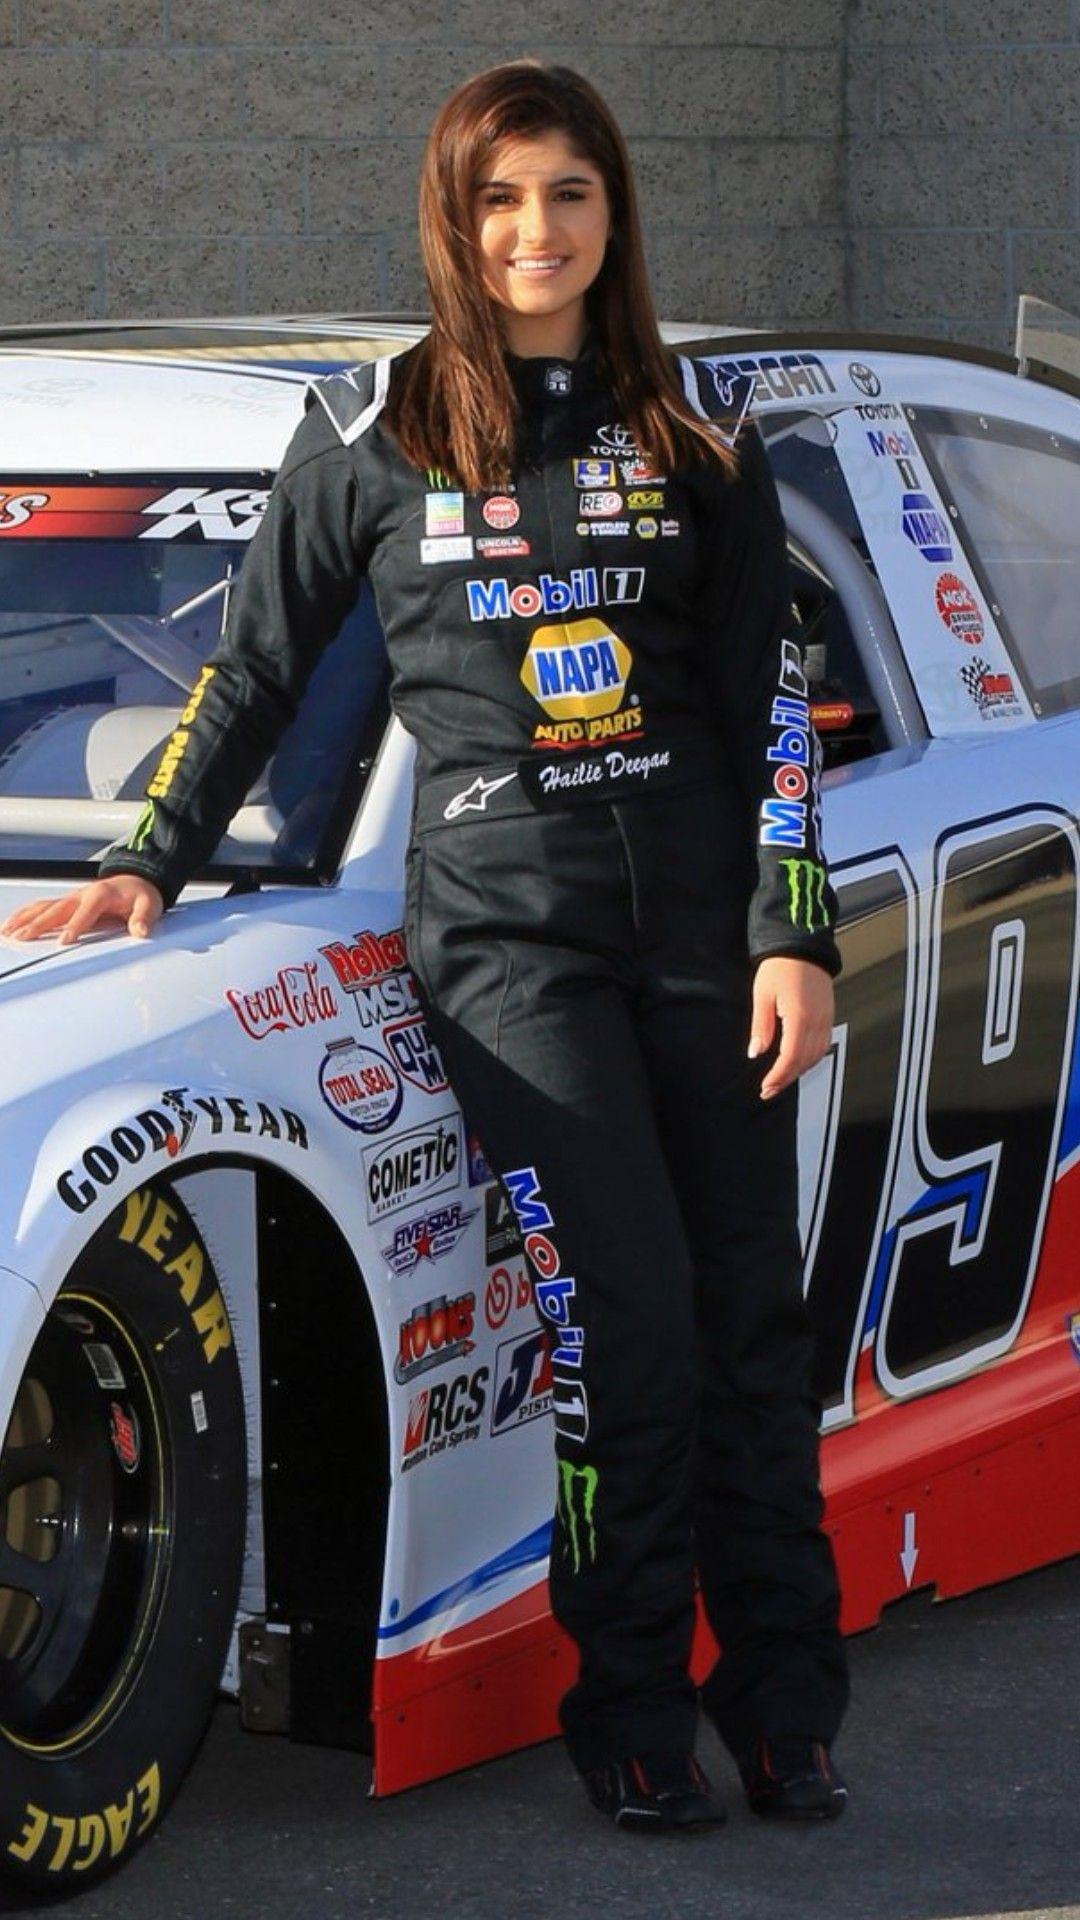 Hallie Deegan Female Race Car Driver Female Racers Racing Girl